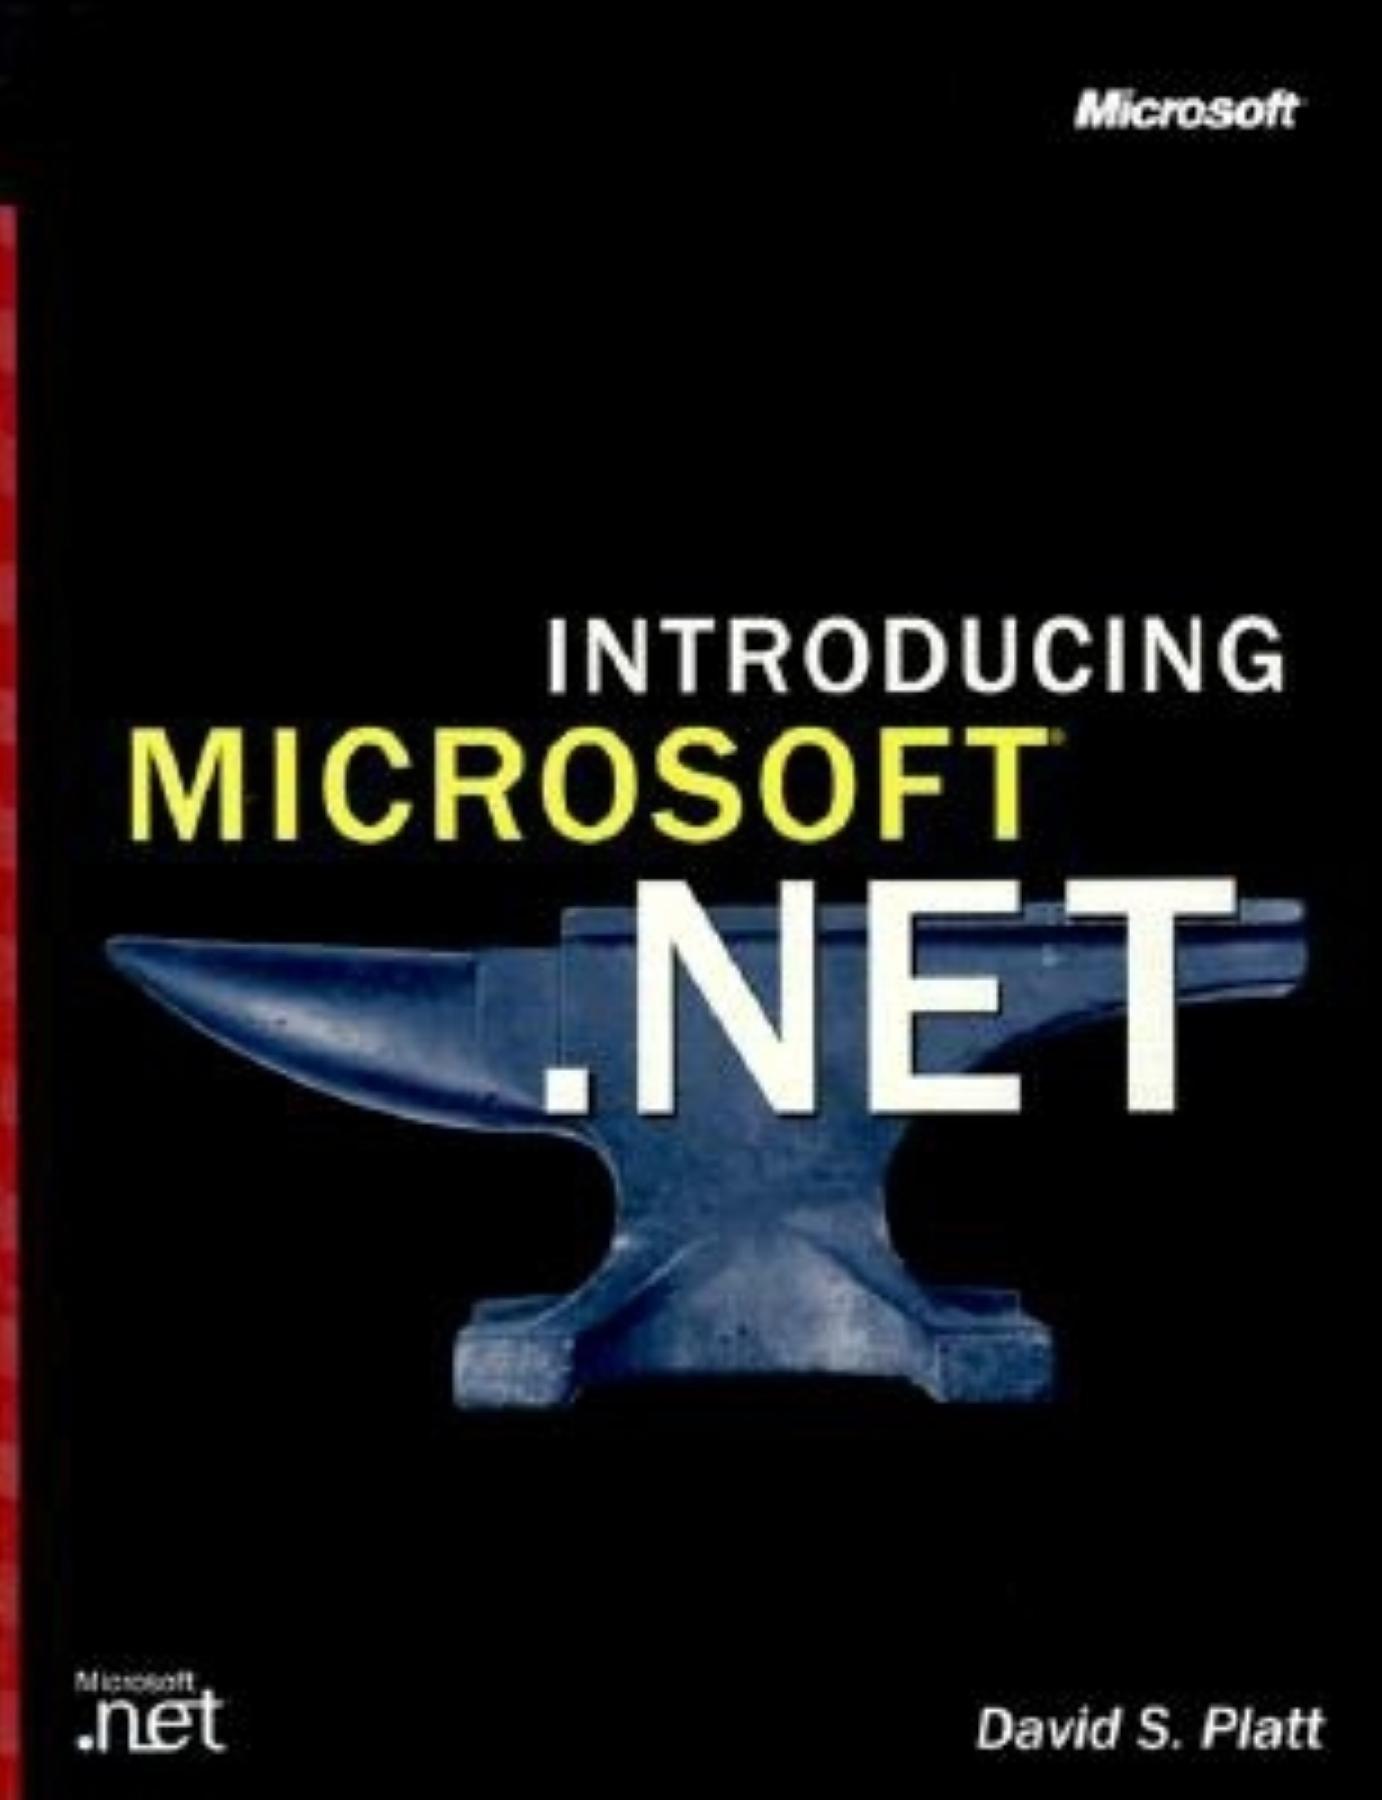 Read Online Introducing Microsoft .Net (Encyclopedia of Visual Medicine) PDF